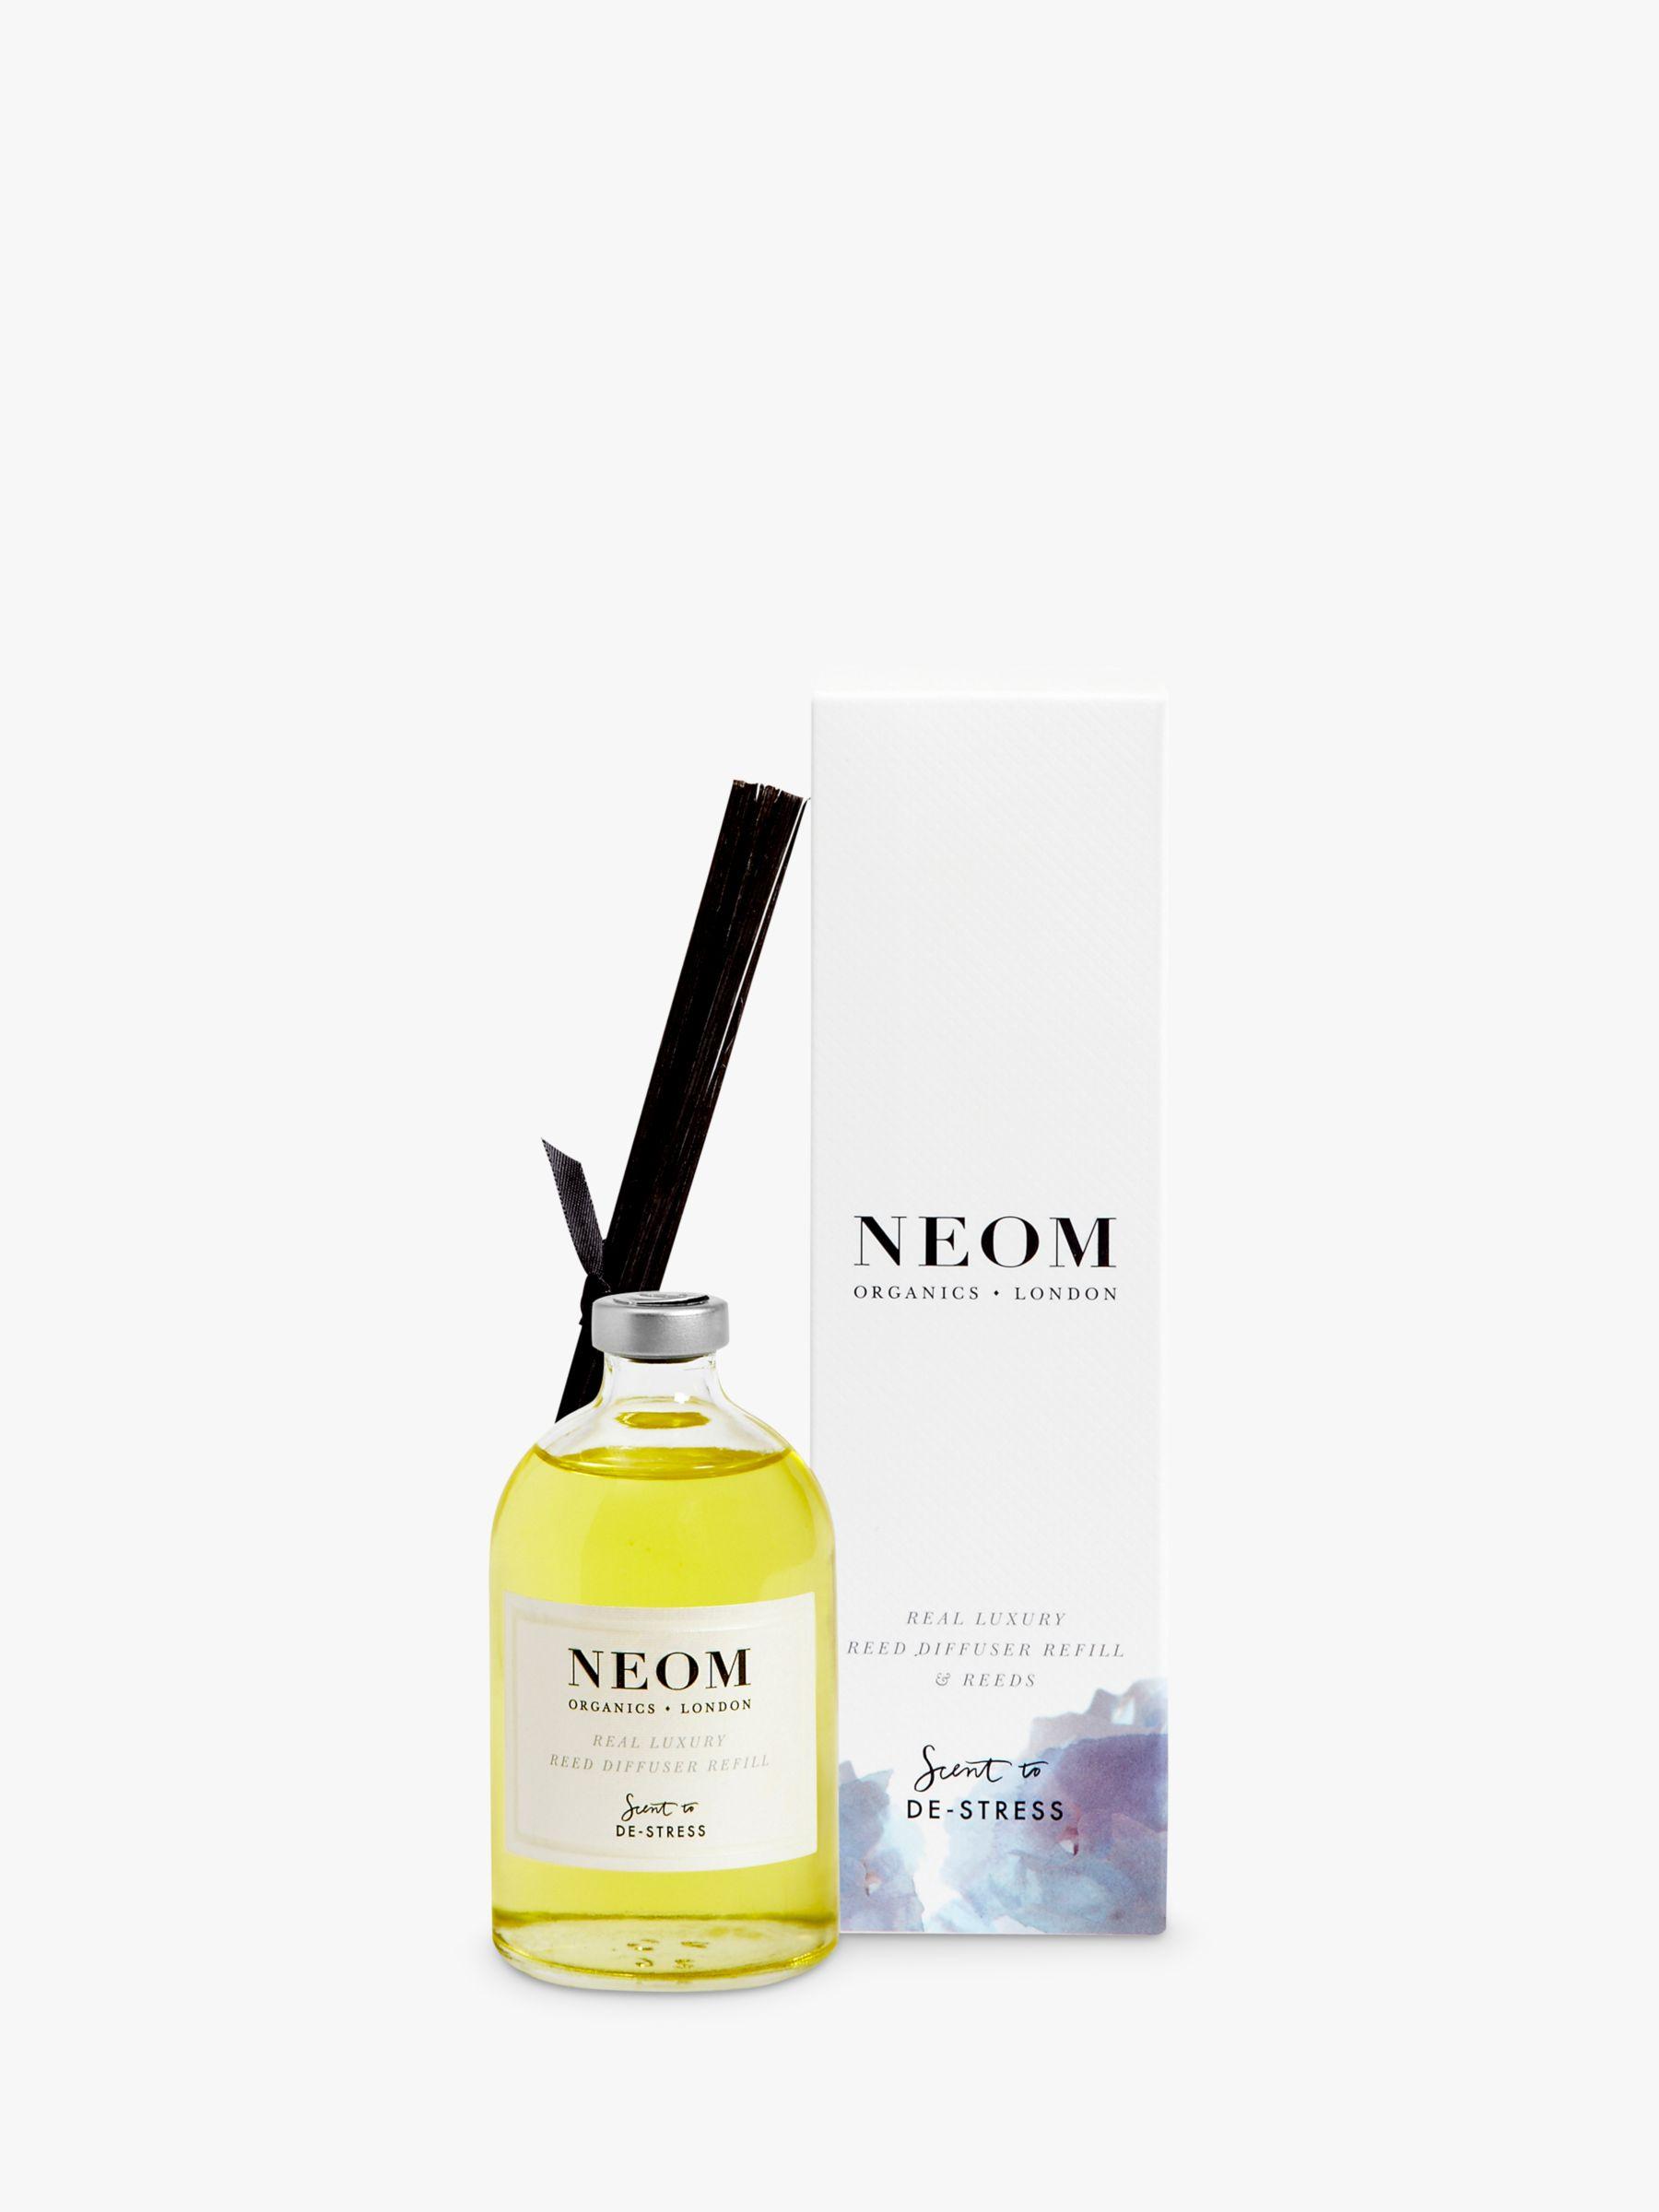 Neom Neom Real Luxury Diffuser Refill, 100ml